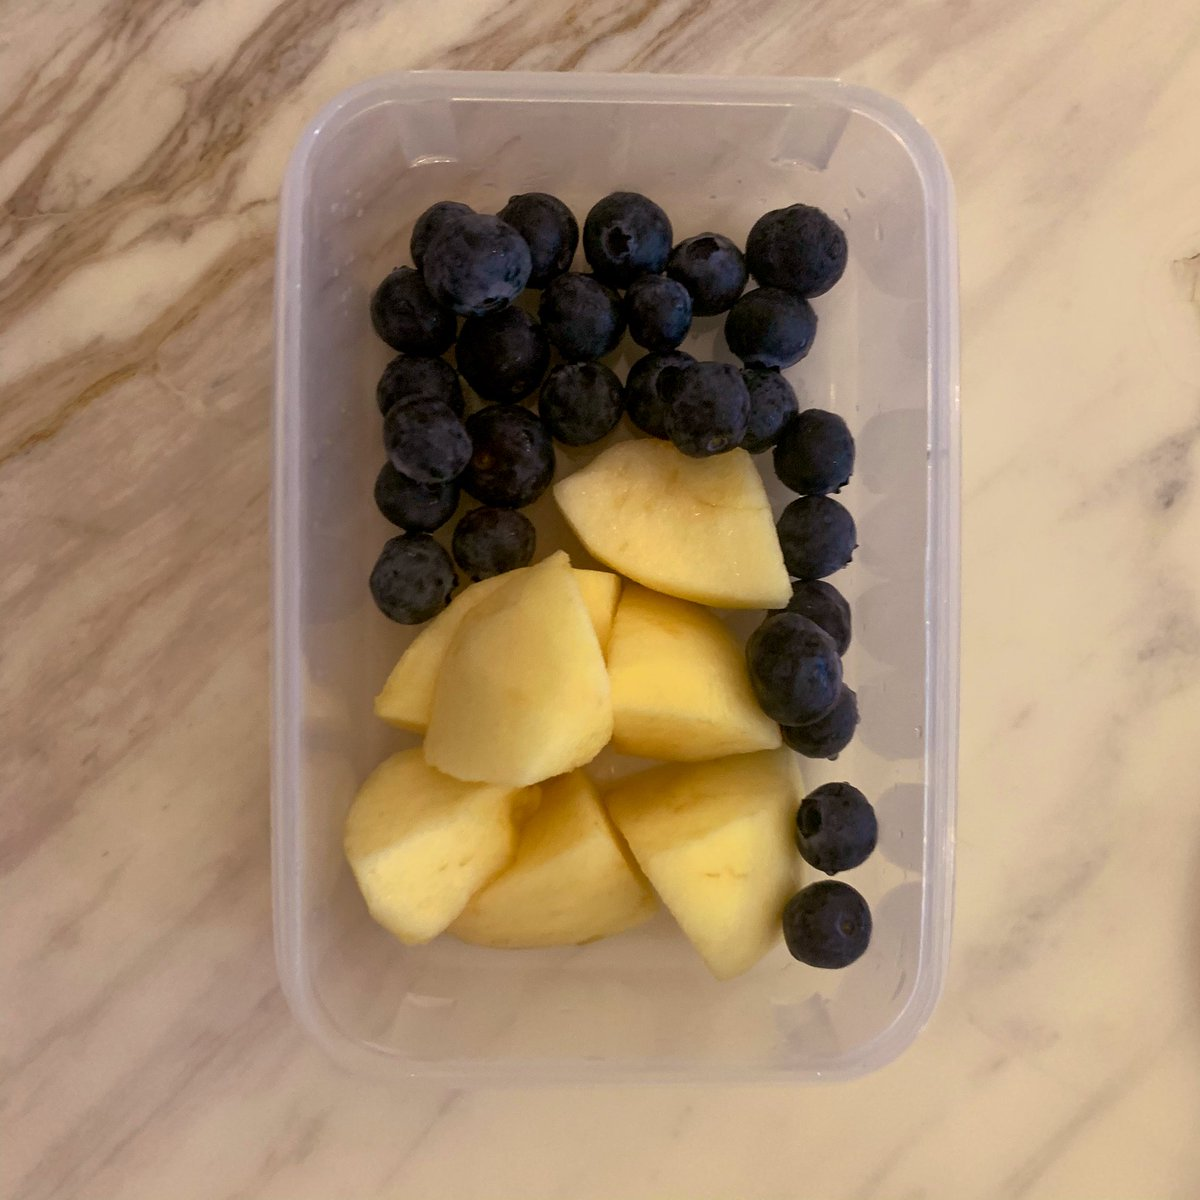 Love #blueberry https://t.co/lhVOwogLJA